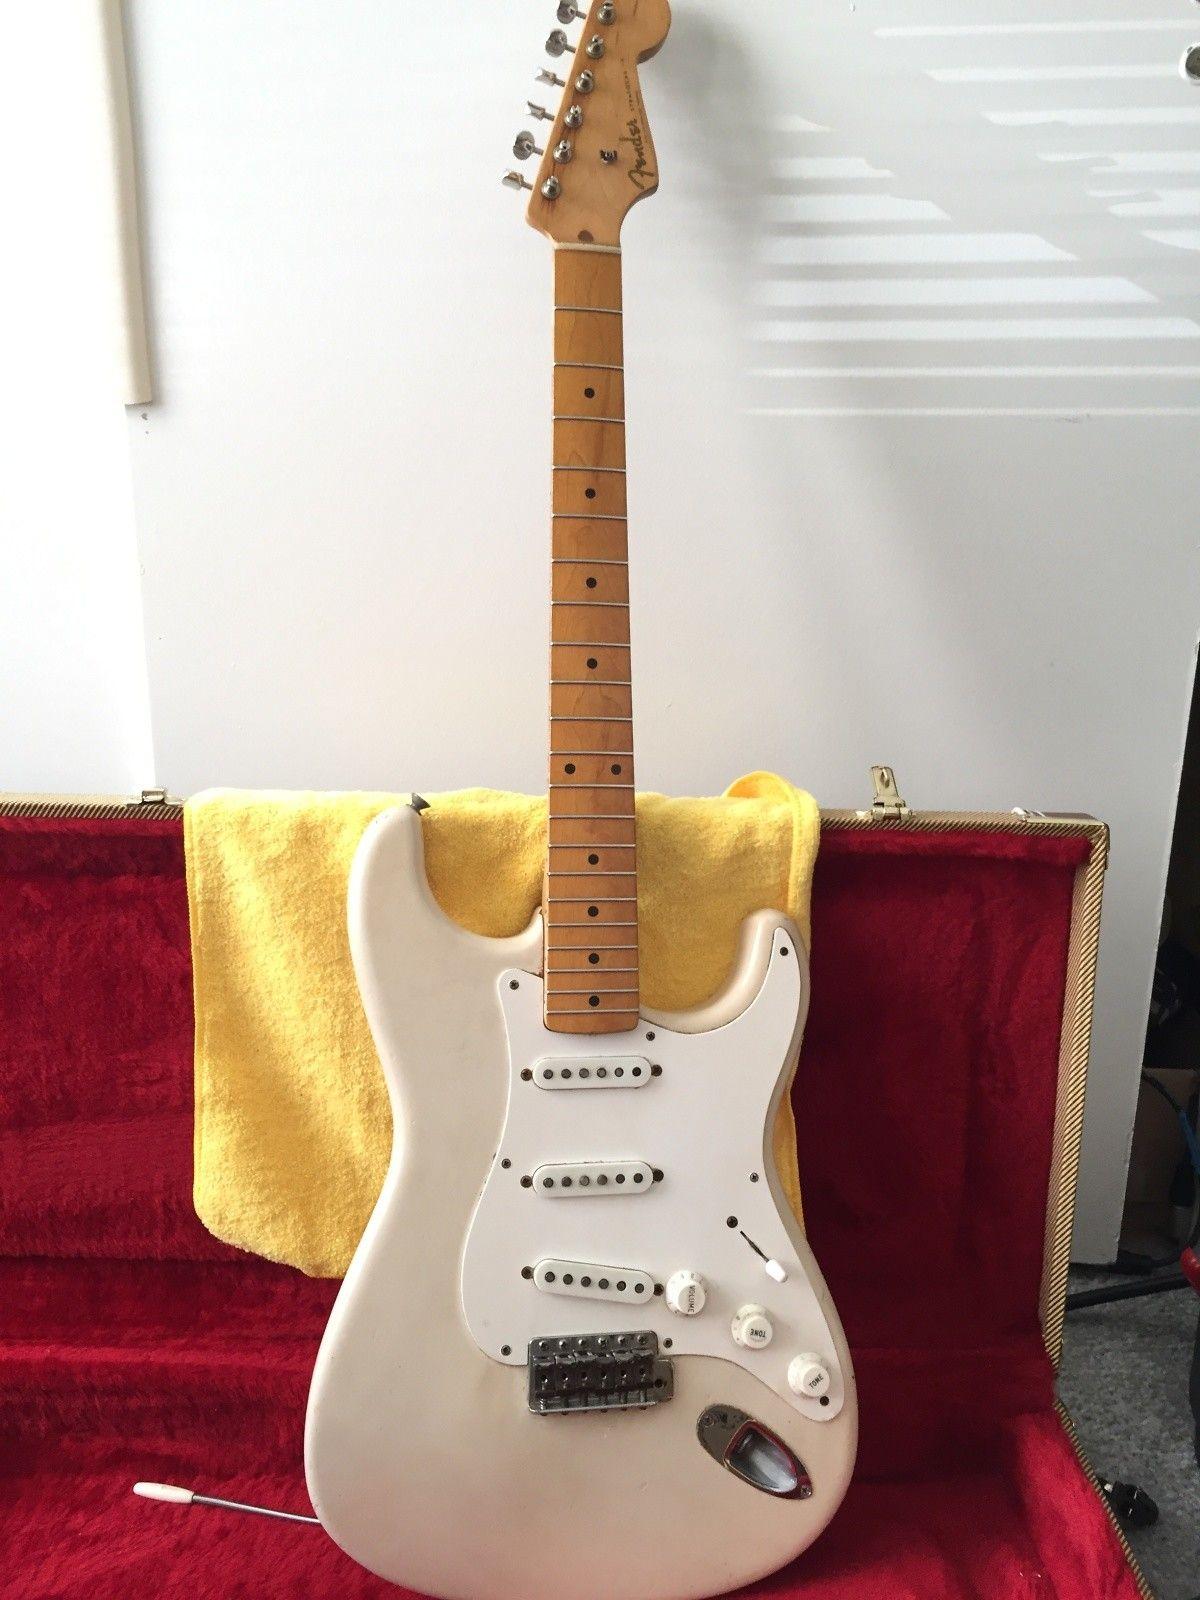 Original Fender Stratocaster 1959 Vintage White | Reverb